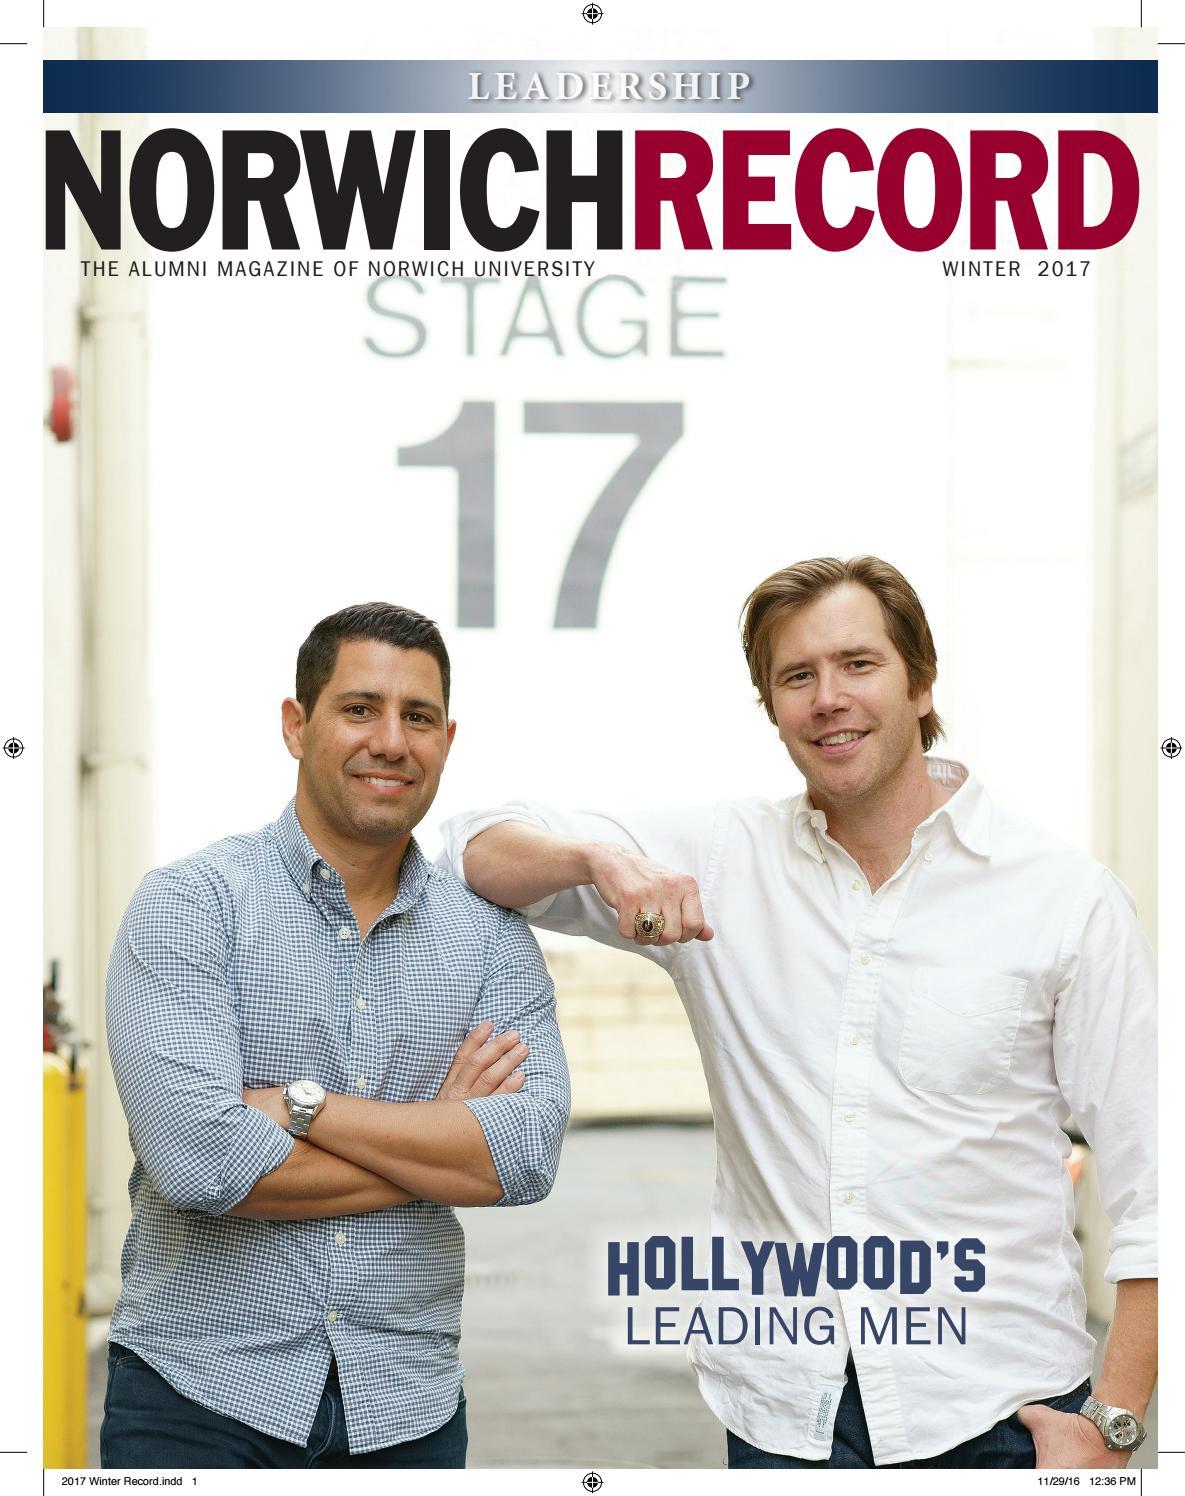 NORWICH RECORD | Winter 2017 by Norwich University - issuu